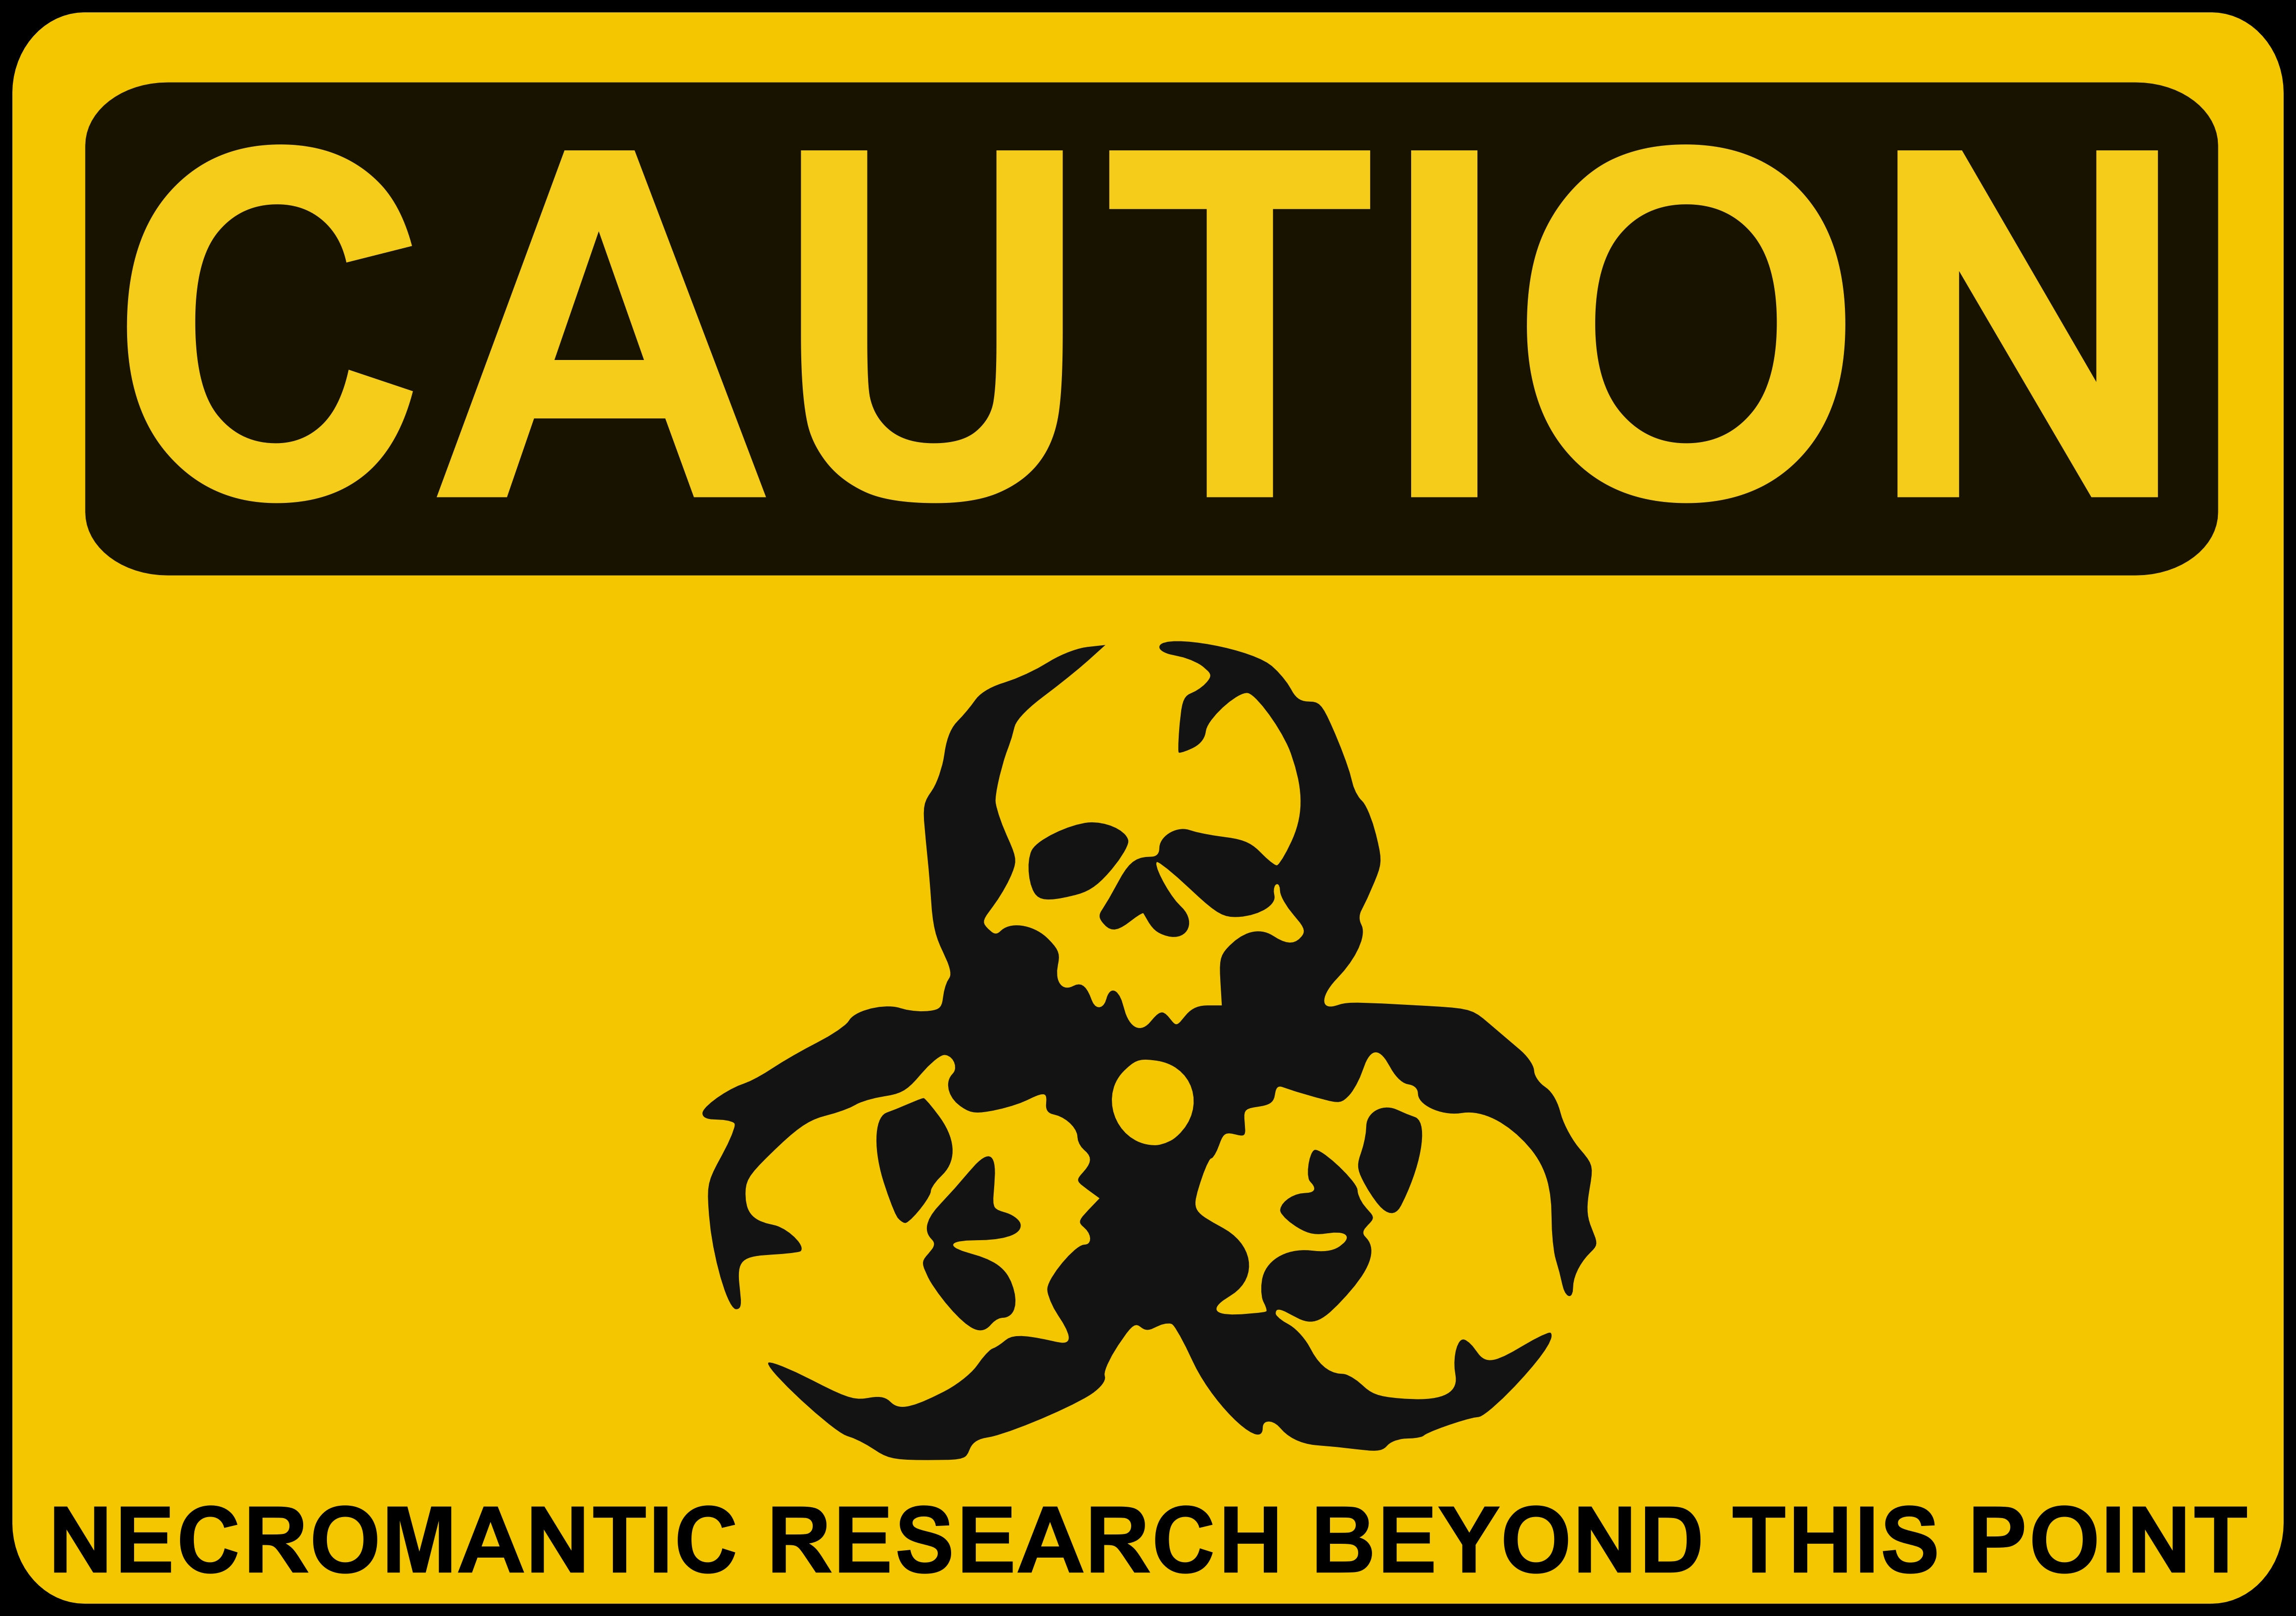 High Resolution Wallpaper   Biohazard 4642x3268 px